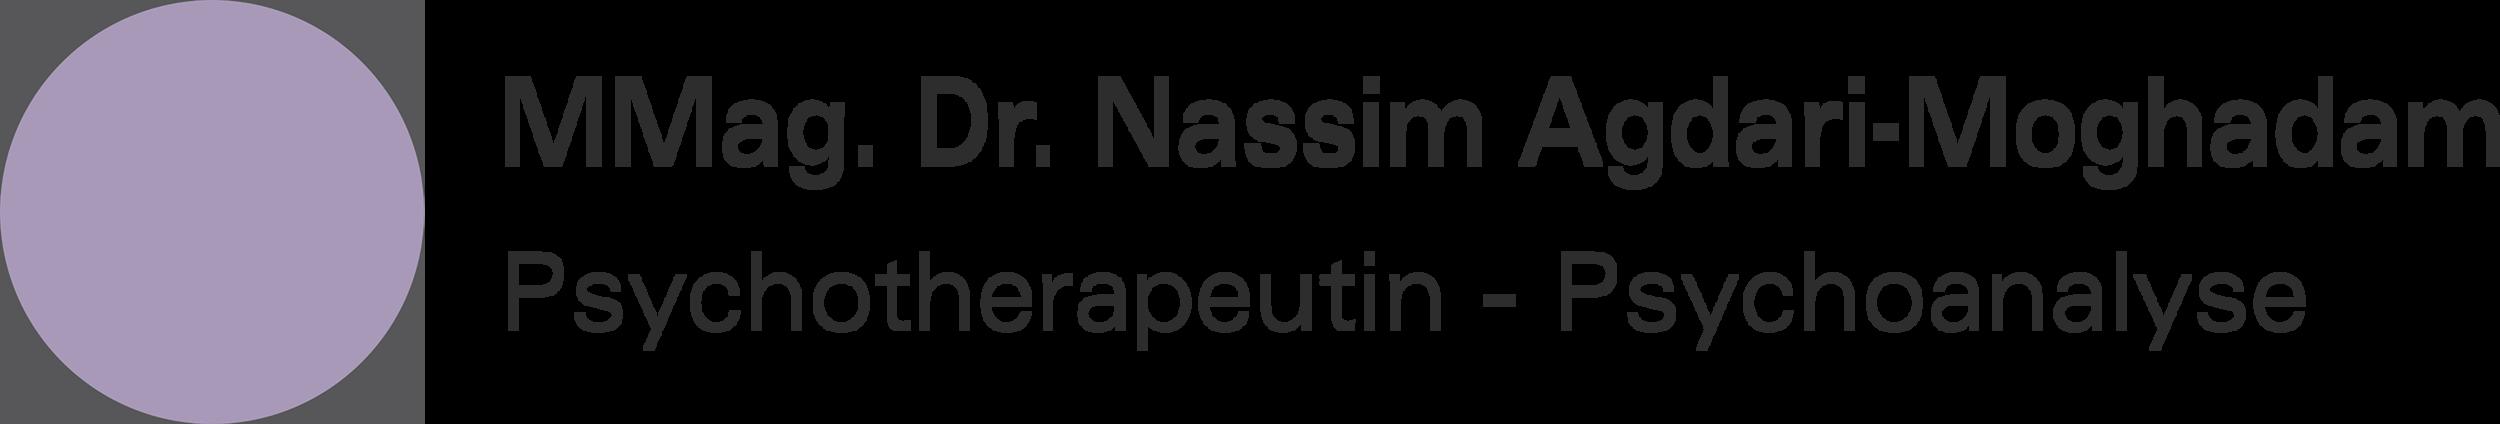 Nassim Agdari-Moghadam, Psychotherapie, Psychoanalyse, Logo